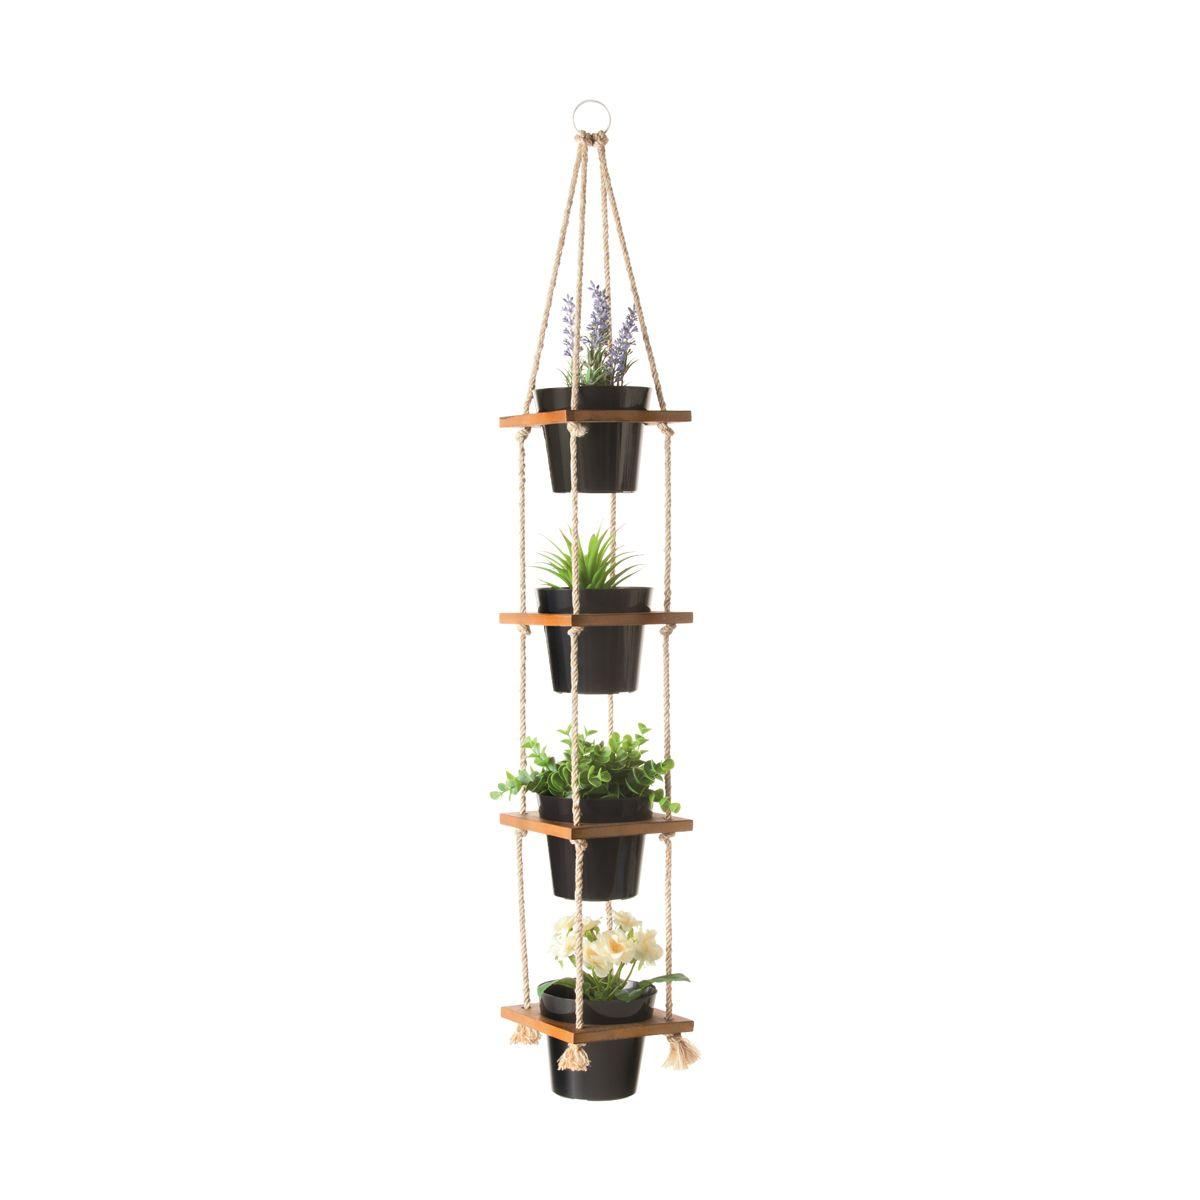 Vertical hanging planter kmart homewares pinterest planters